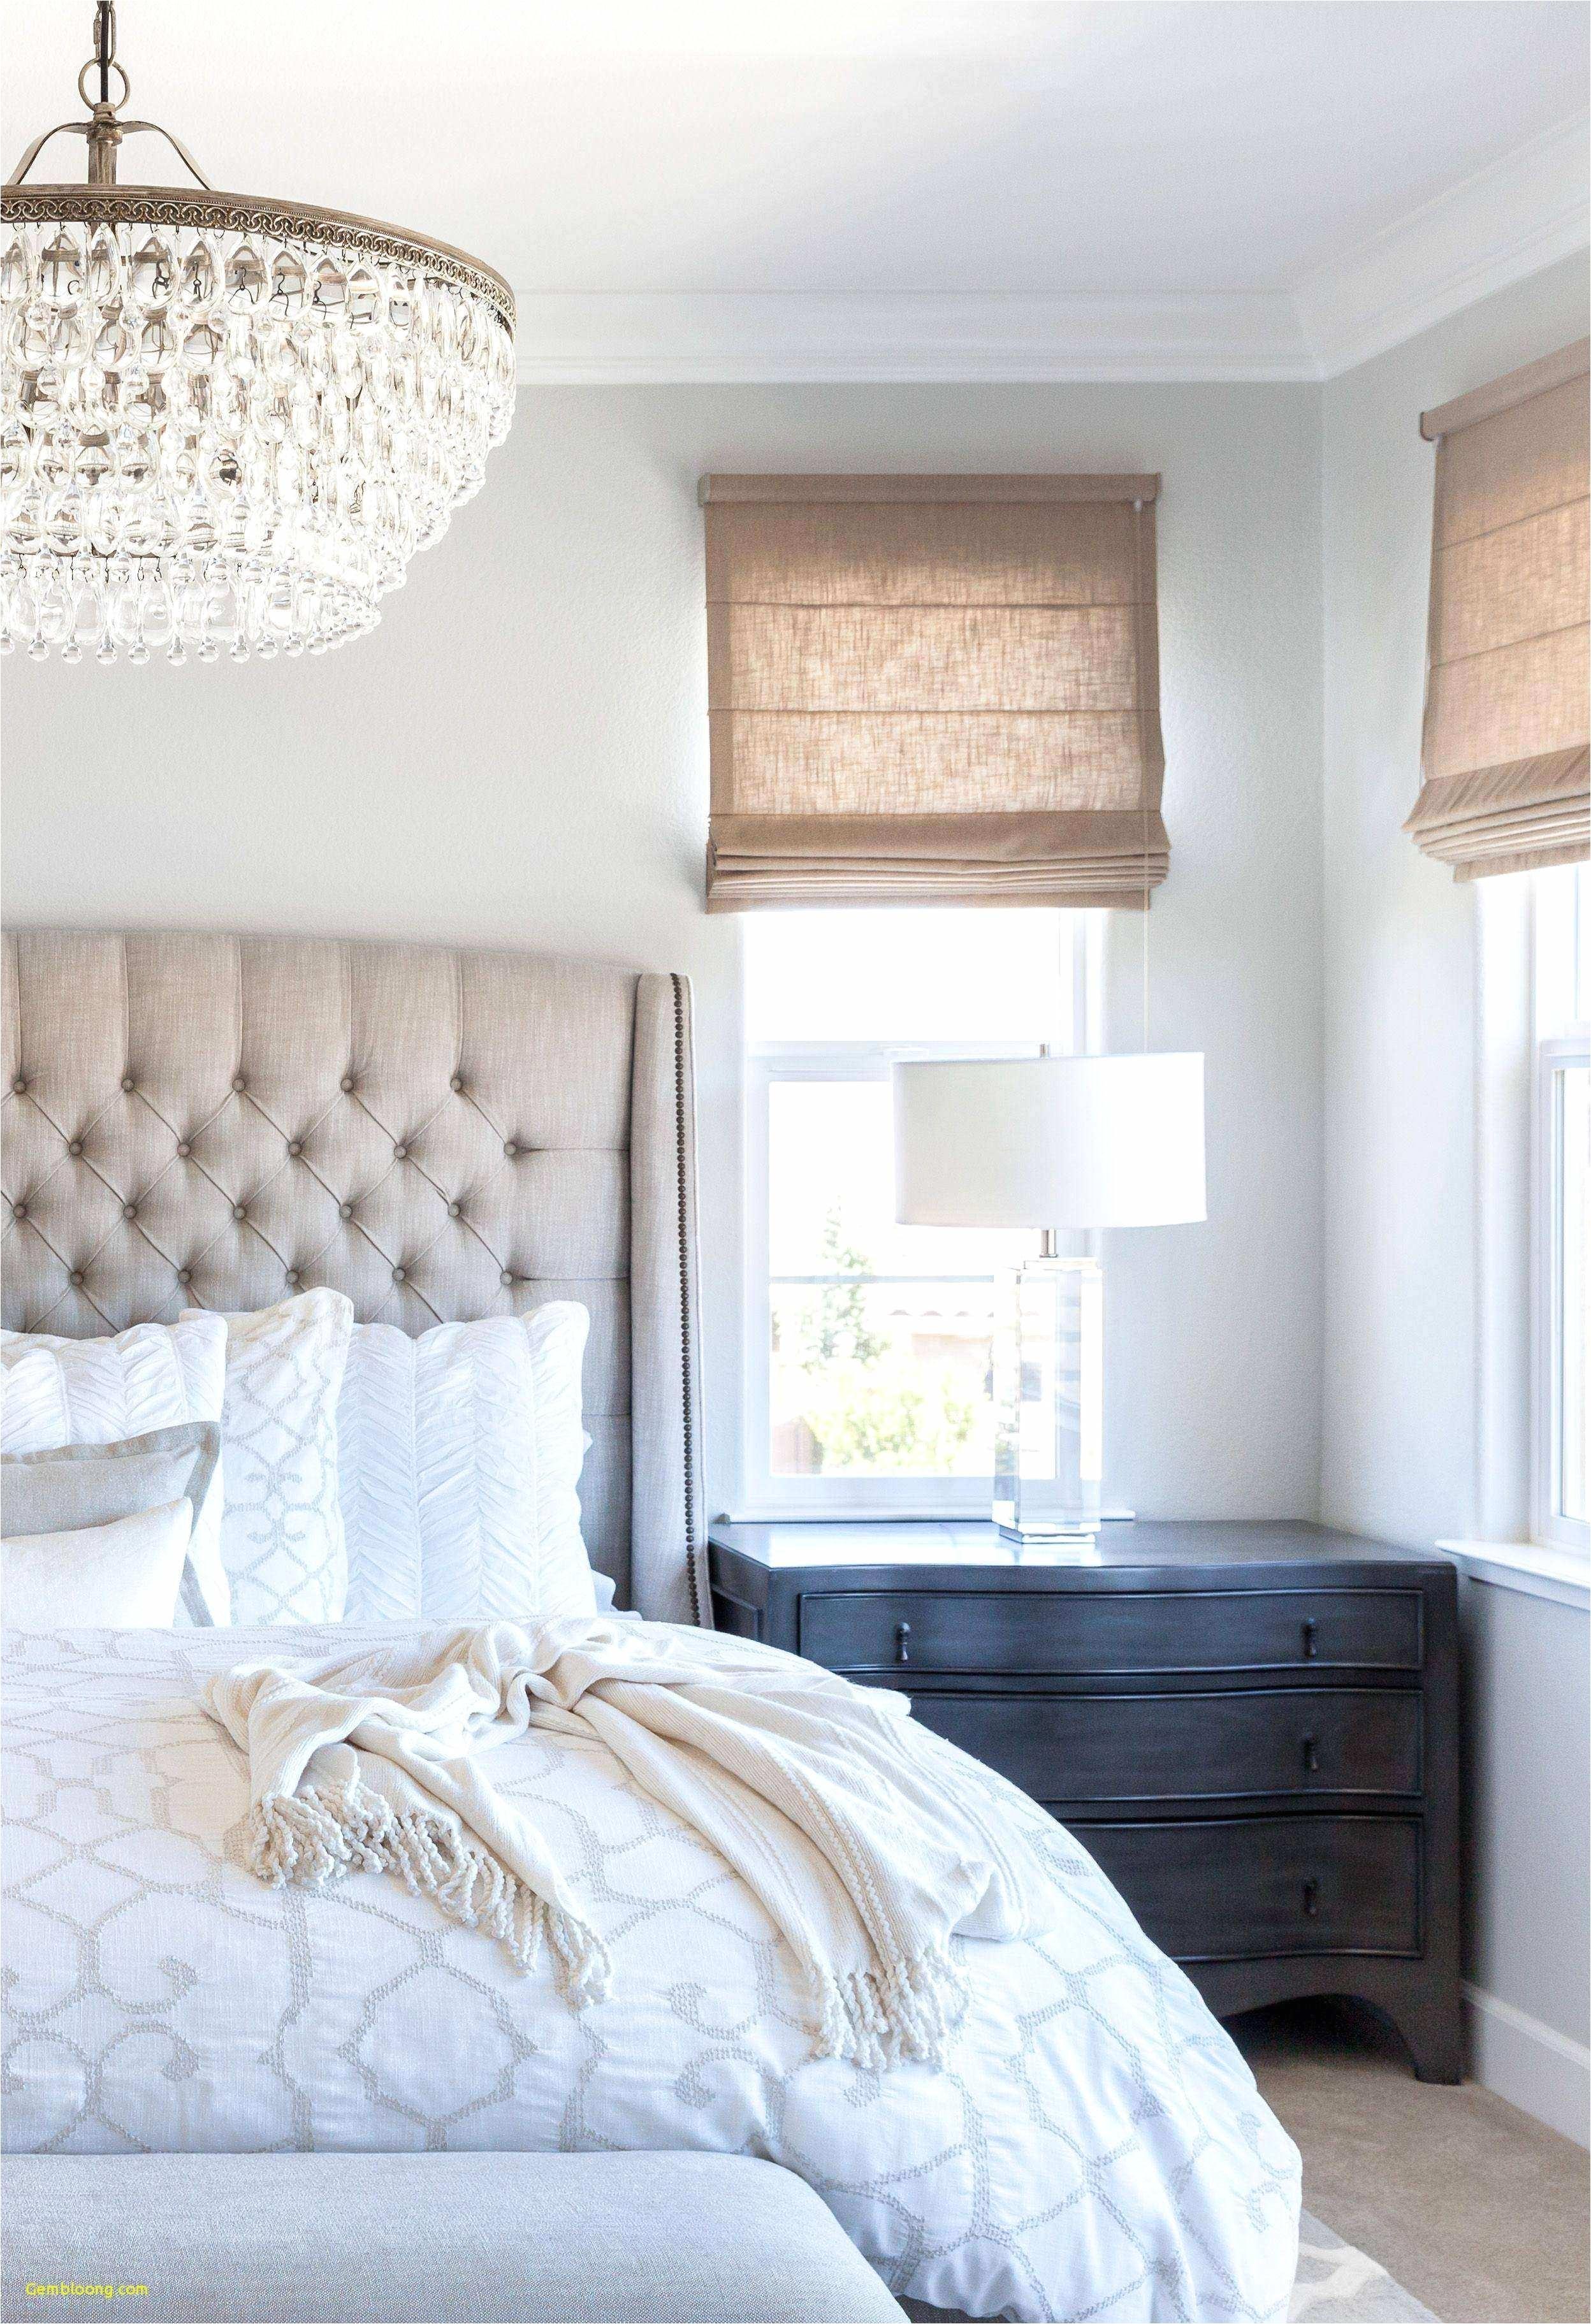 Bedroom Ideas for Teenage Girls Fresh Bedroom Design Ideas for Teenage Girl Bedroom Ideas for